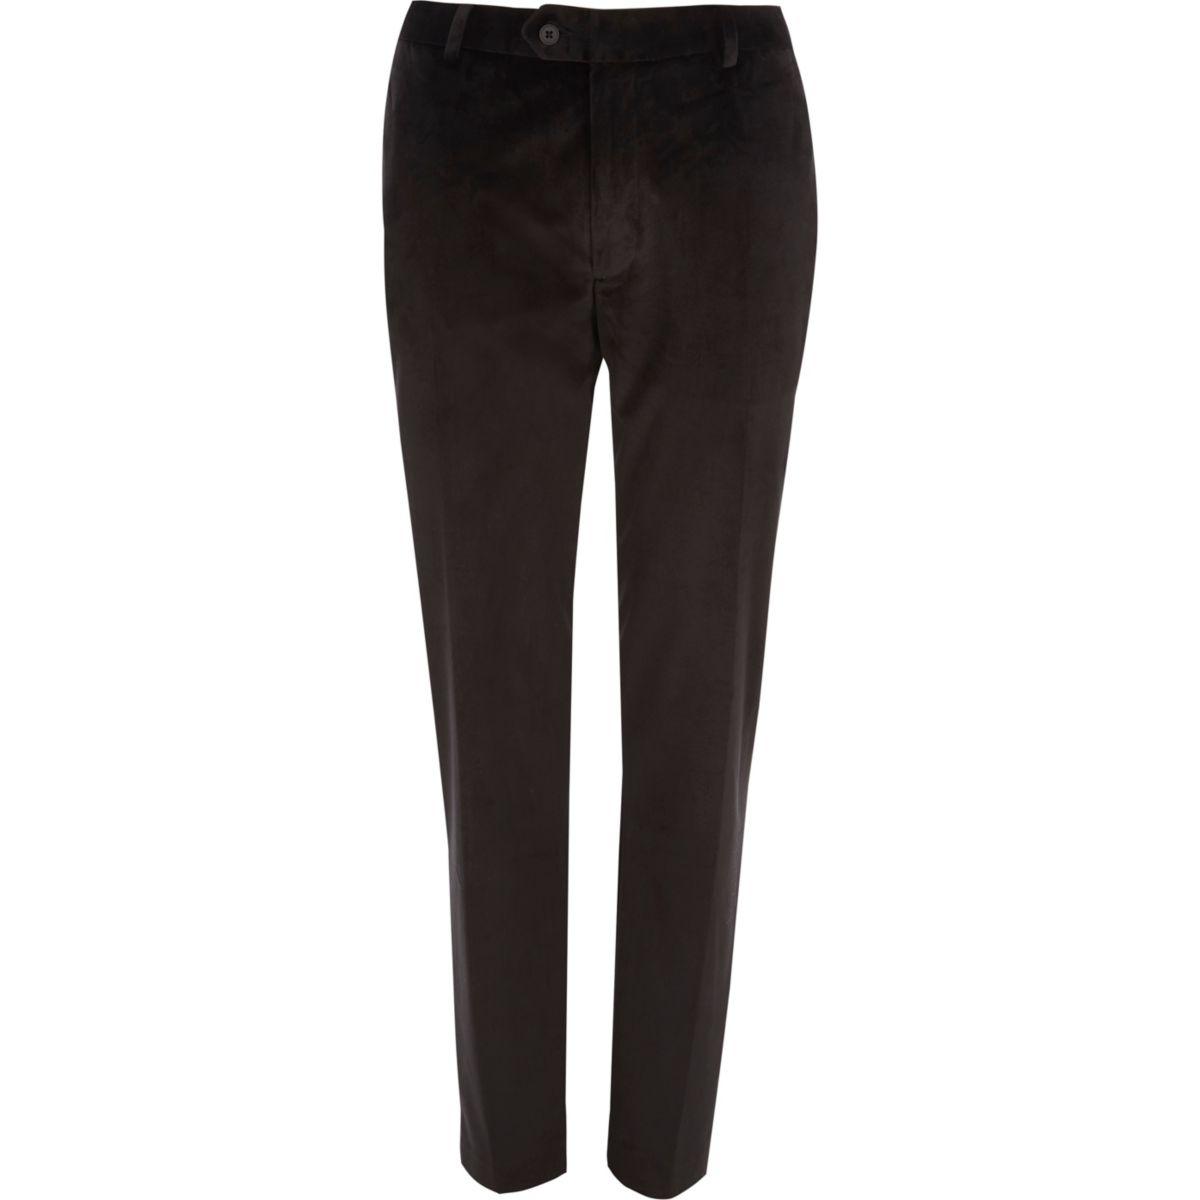 Pantalon habillé skinny en velours noir